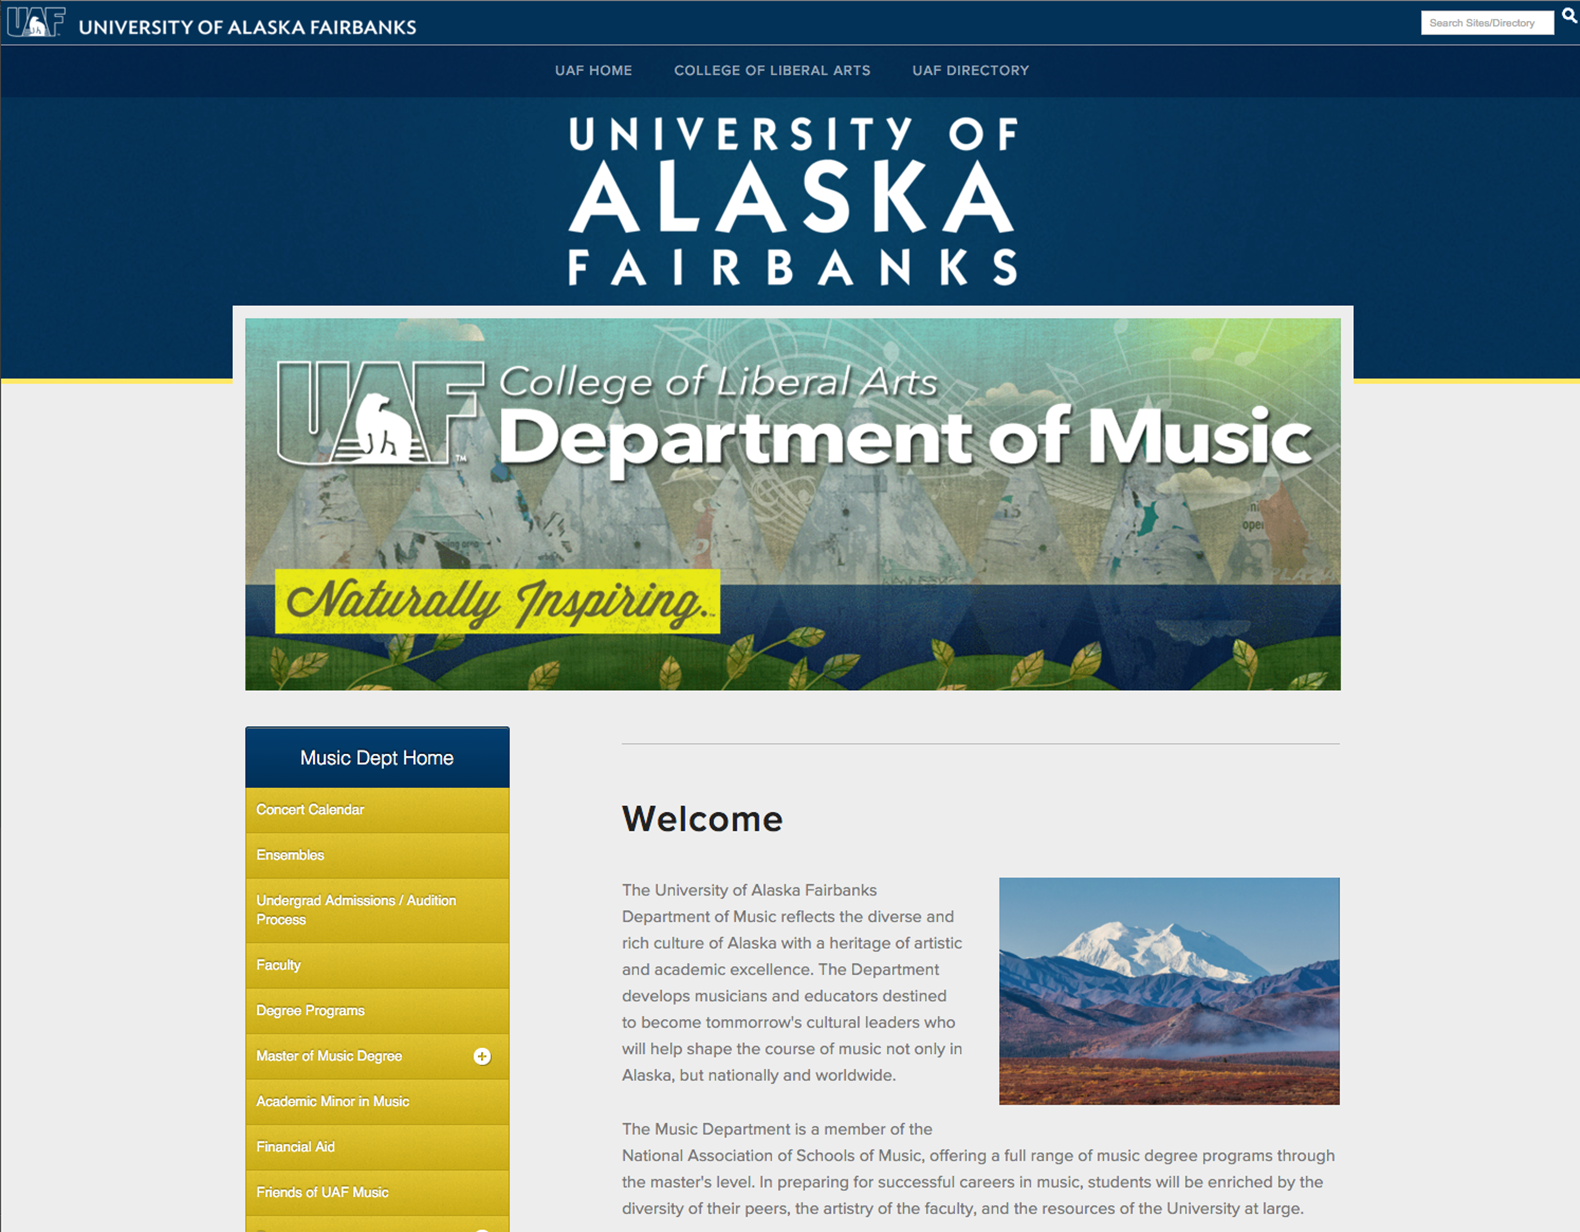 UAF Department of Music